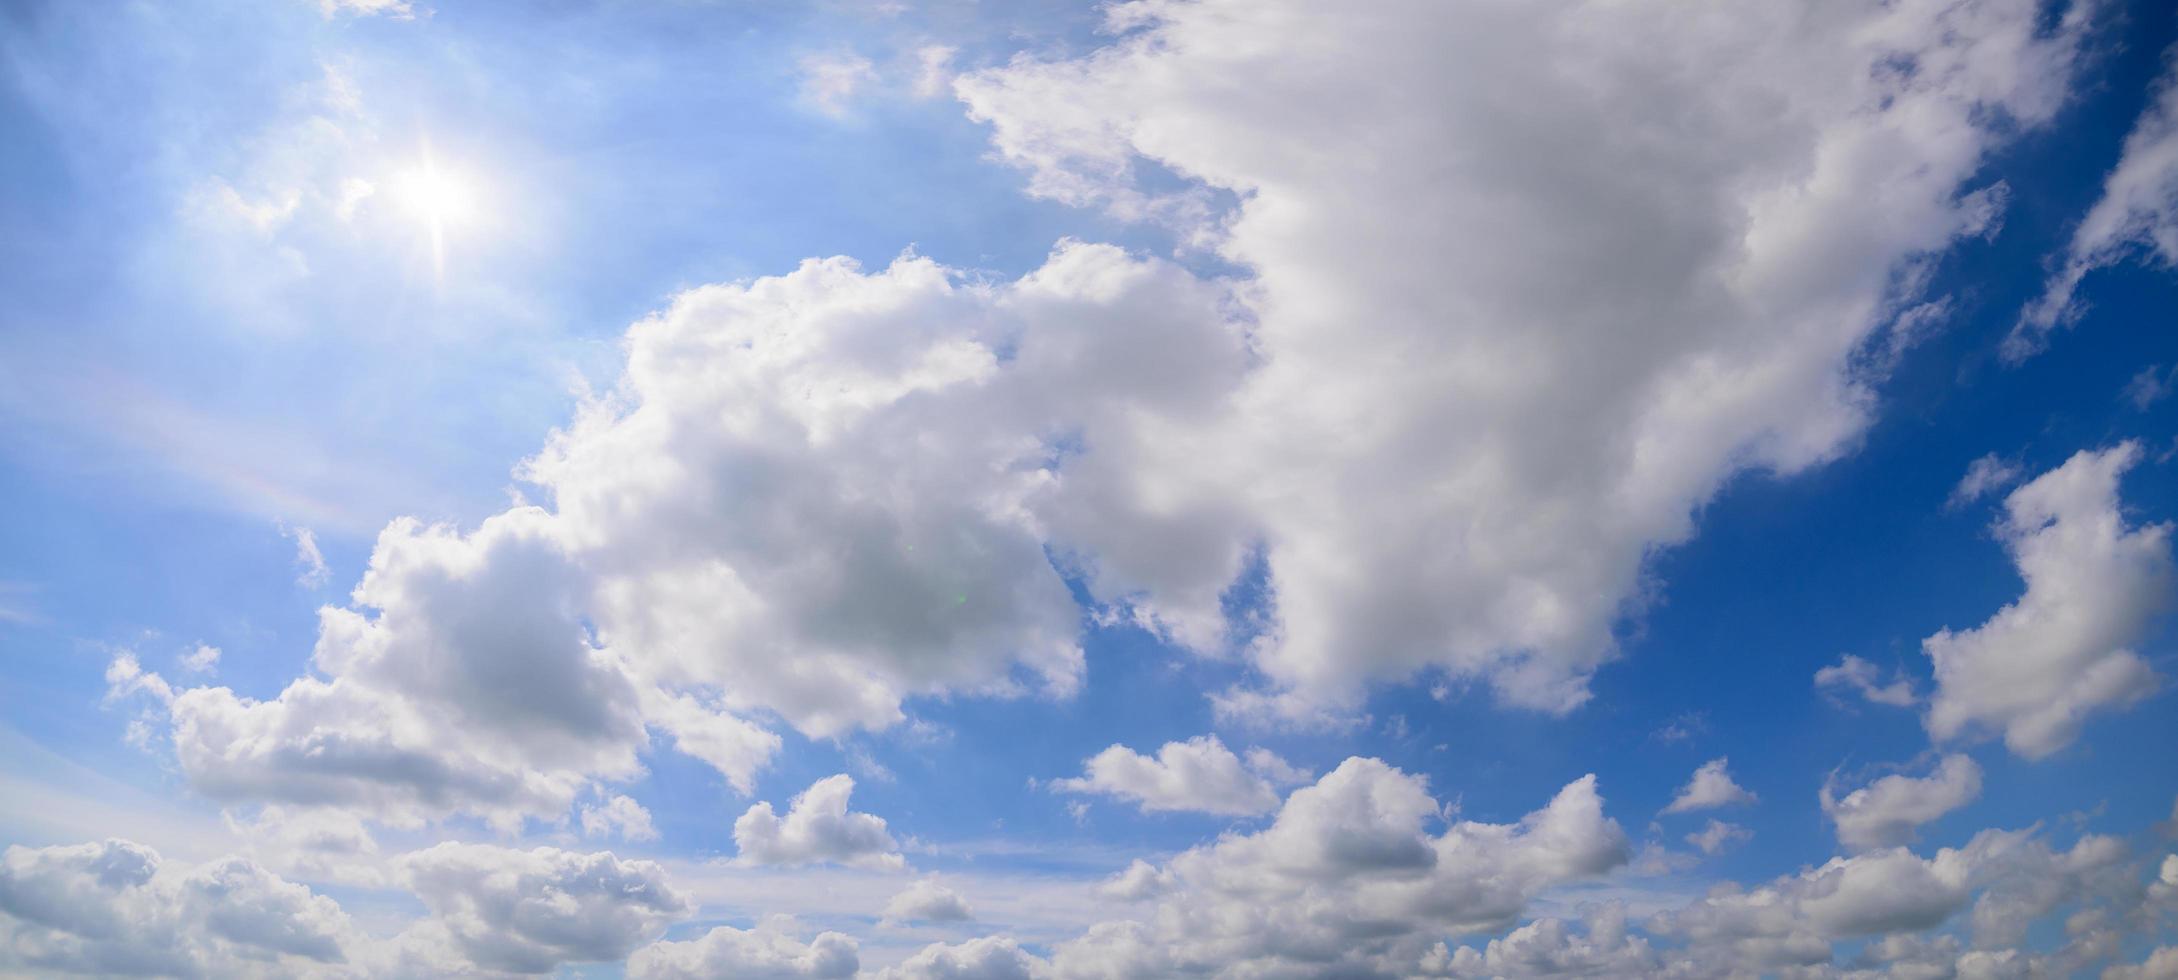 molnhimmel på dagtid foto